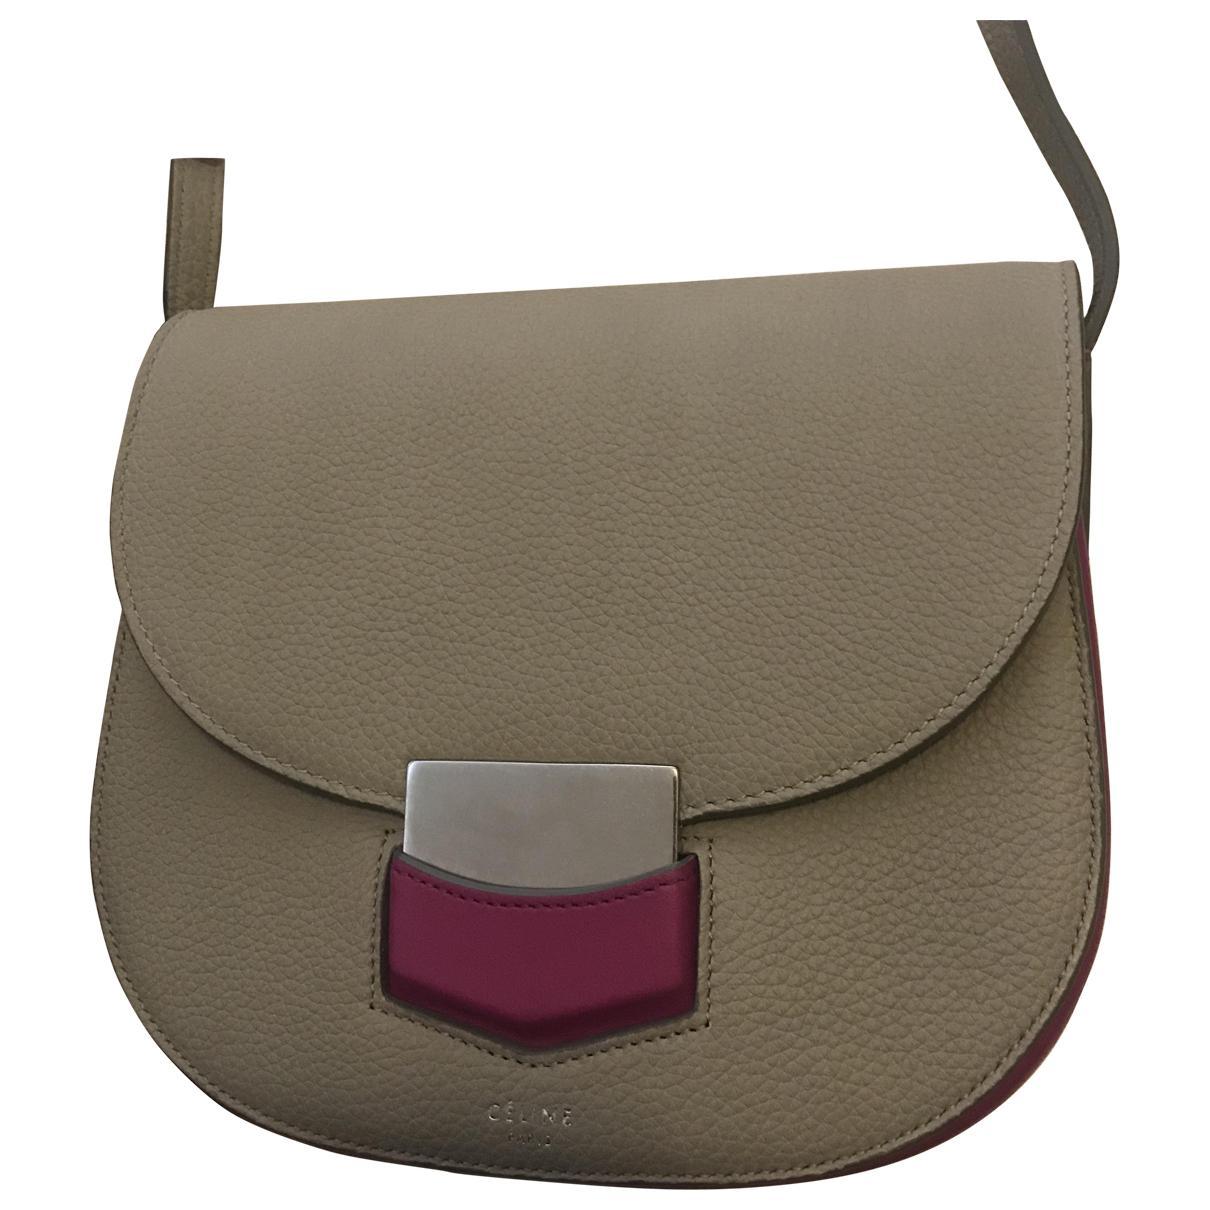 ca81a5795a Céline Trotteur Leather Crossbody Bag in Gray - Lyst